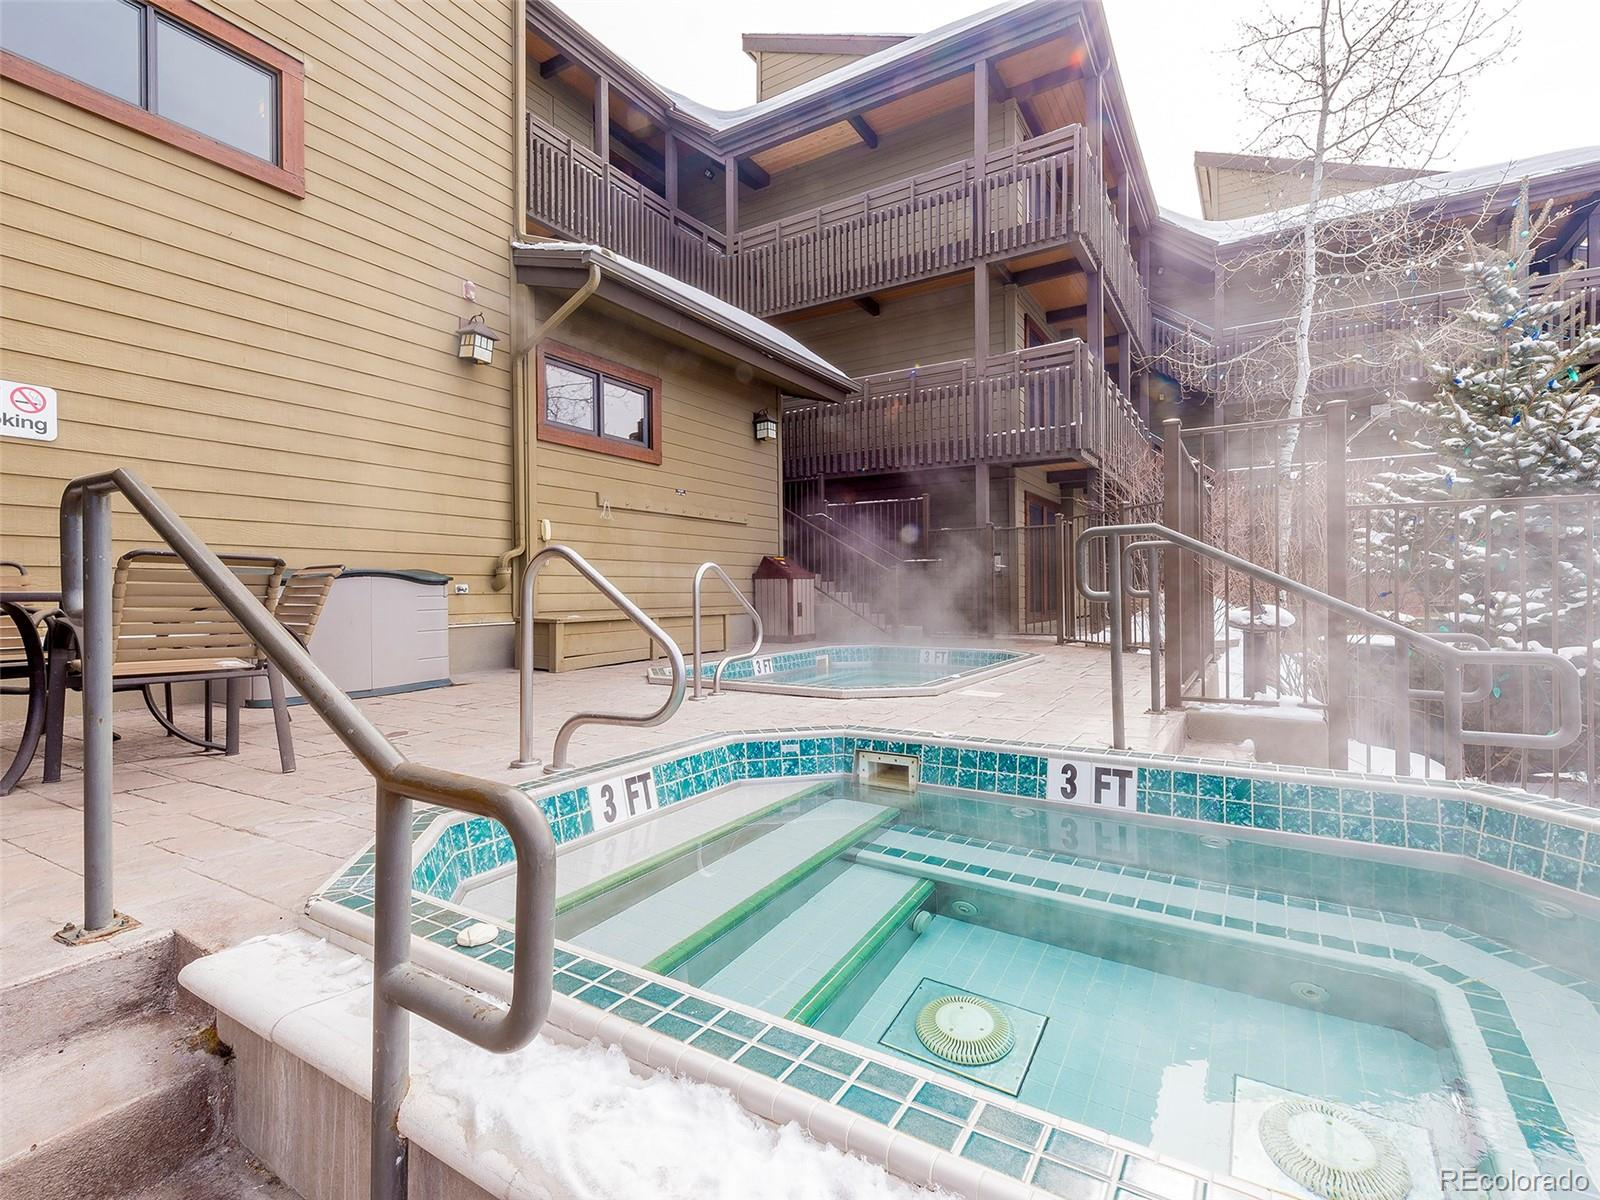 MLS# 4193338 - 19 - 2700 Village Drive #D-204, Steamboat Springs, CO 80487